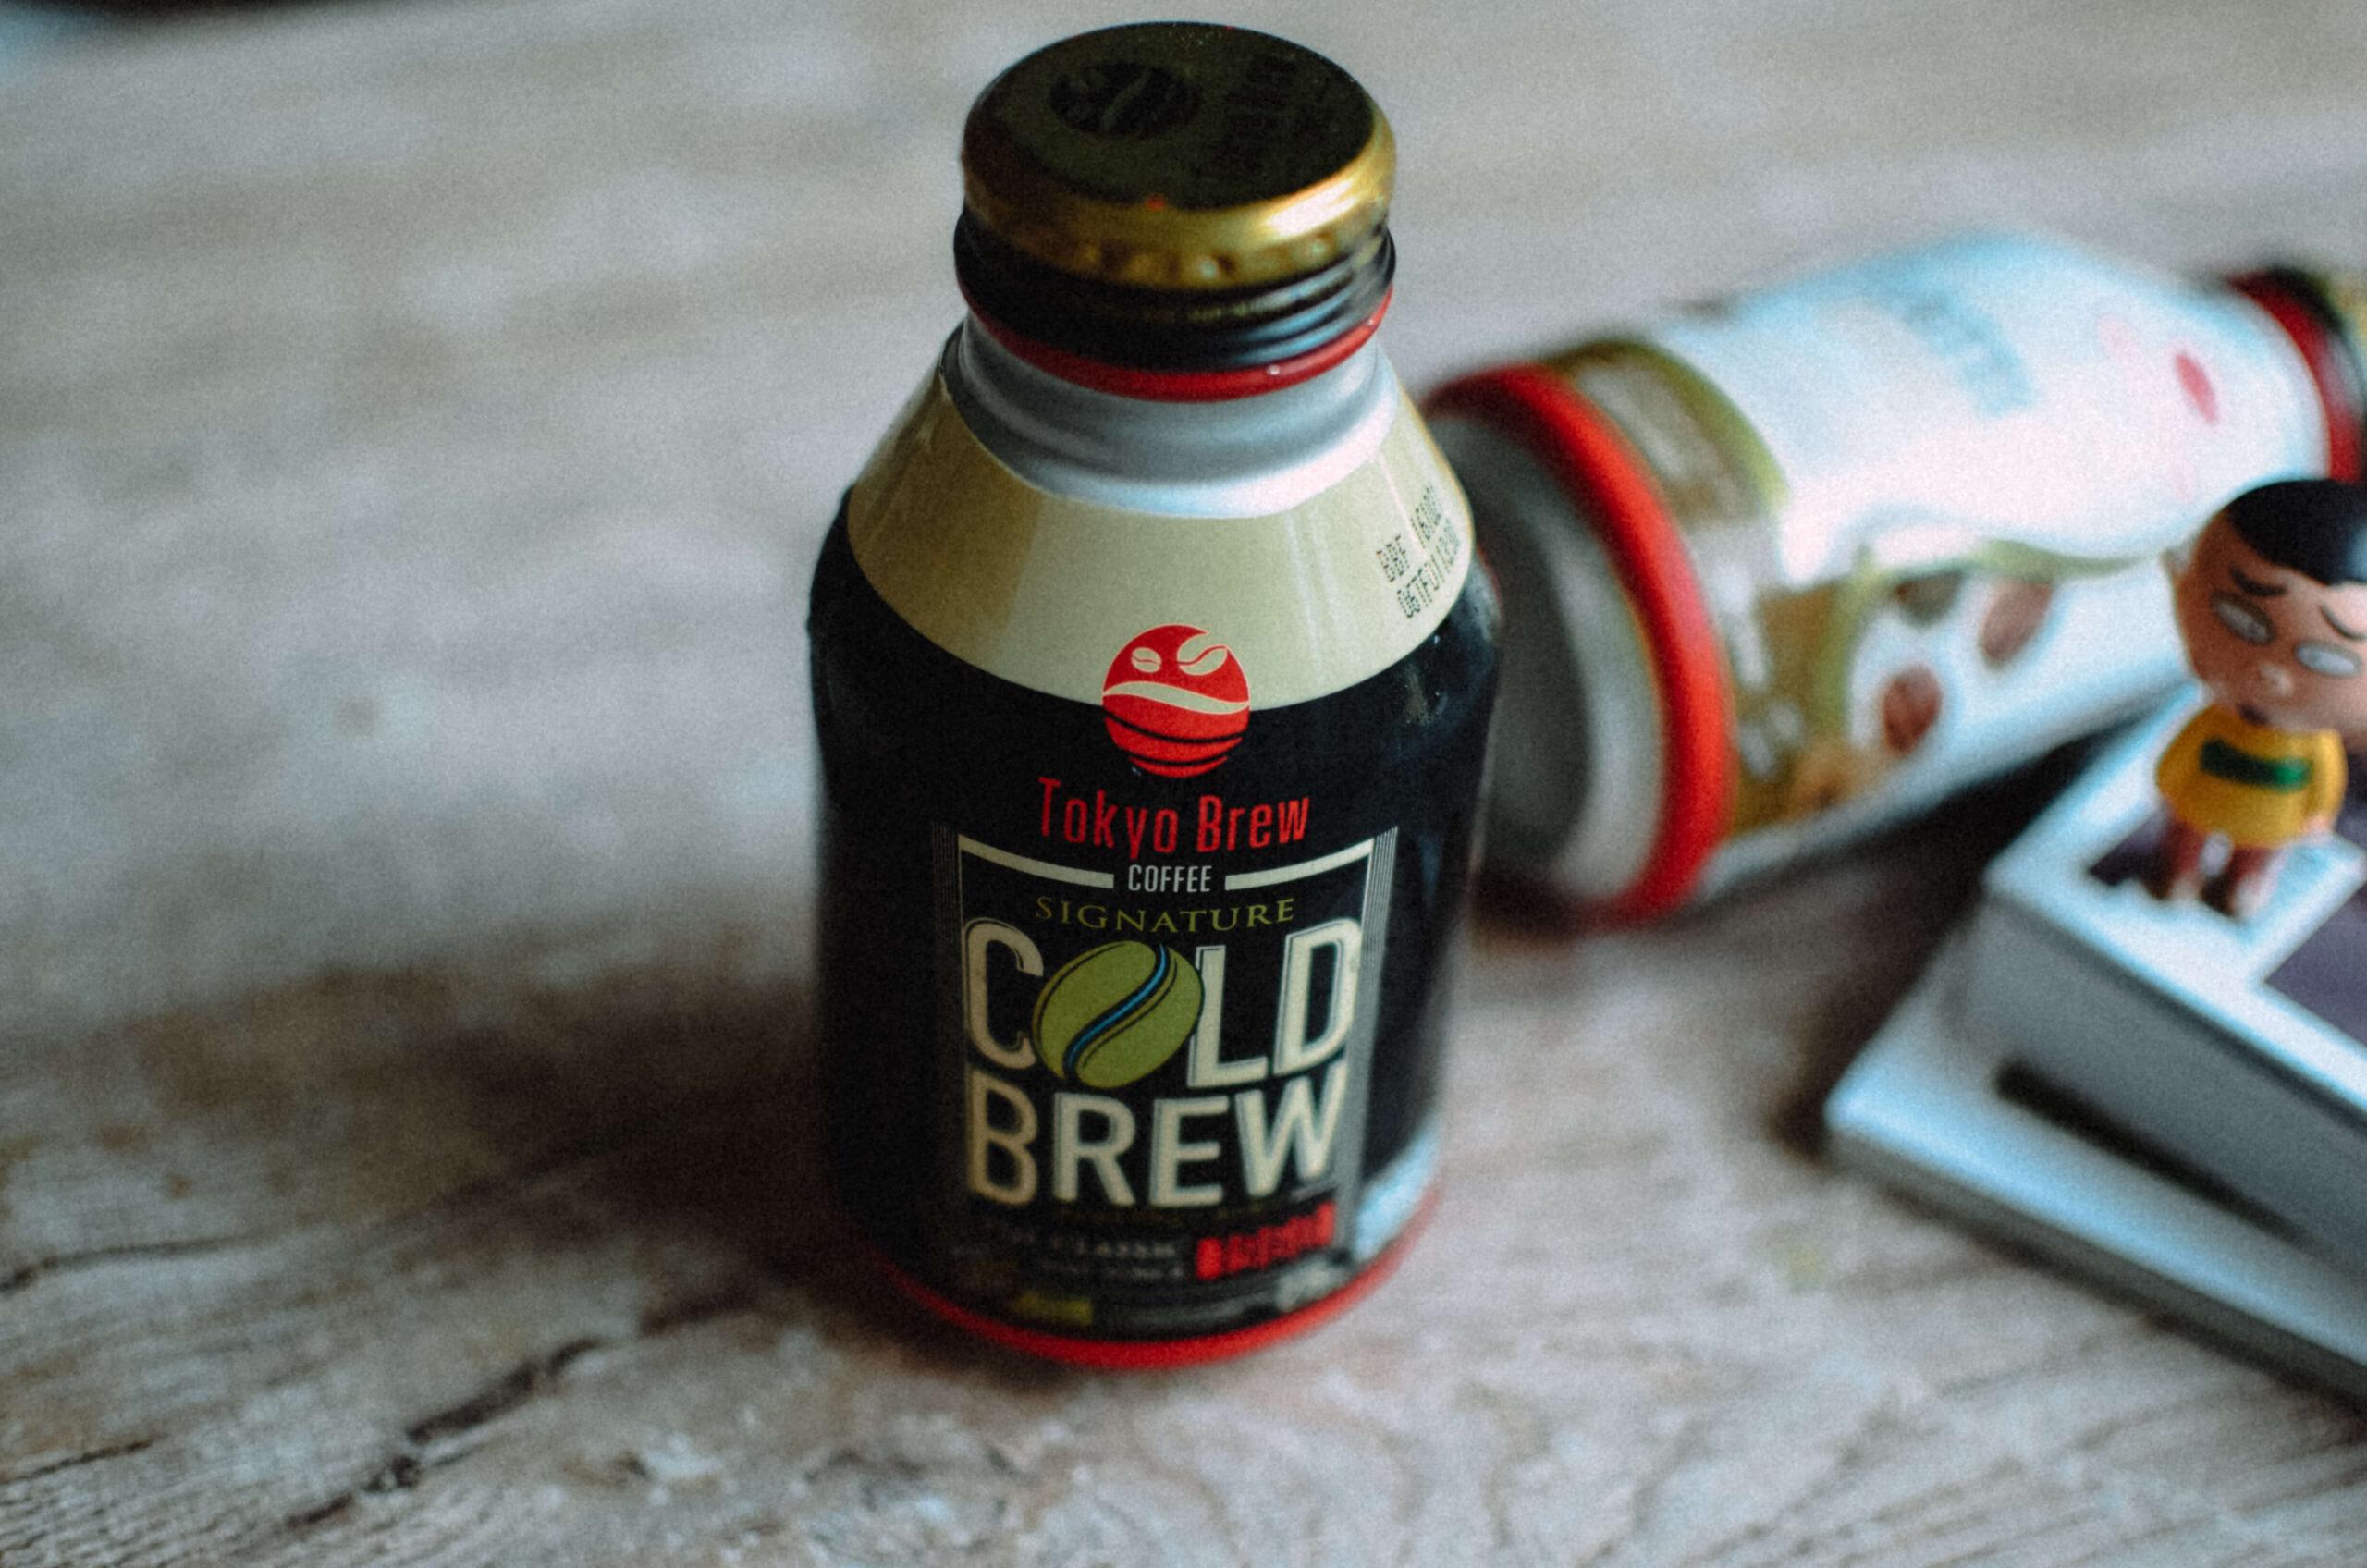 tokyo brew coffee Cold Brew